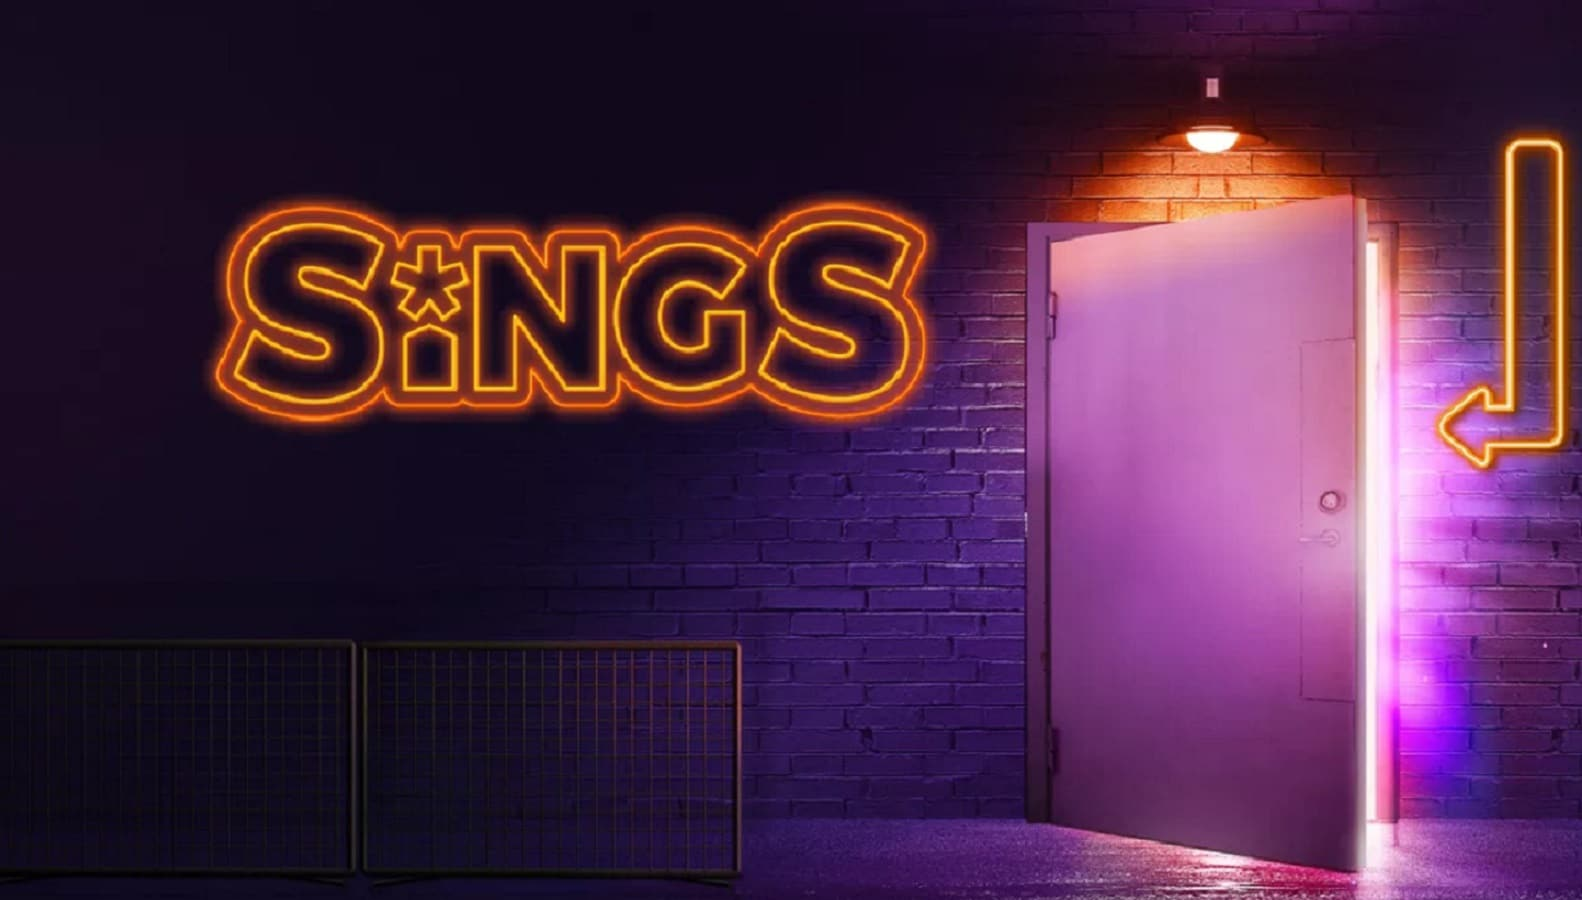 twitch sings logo